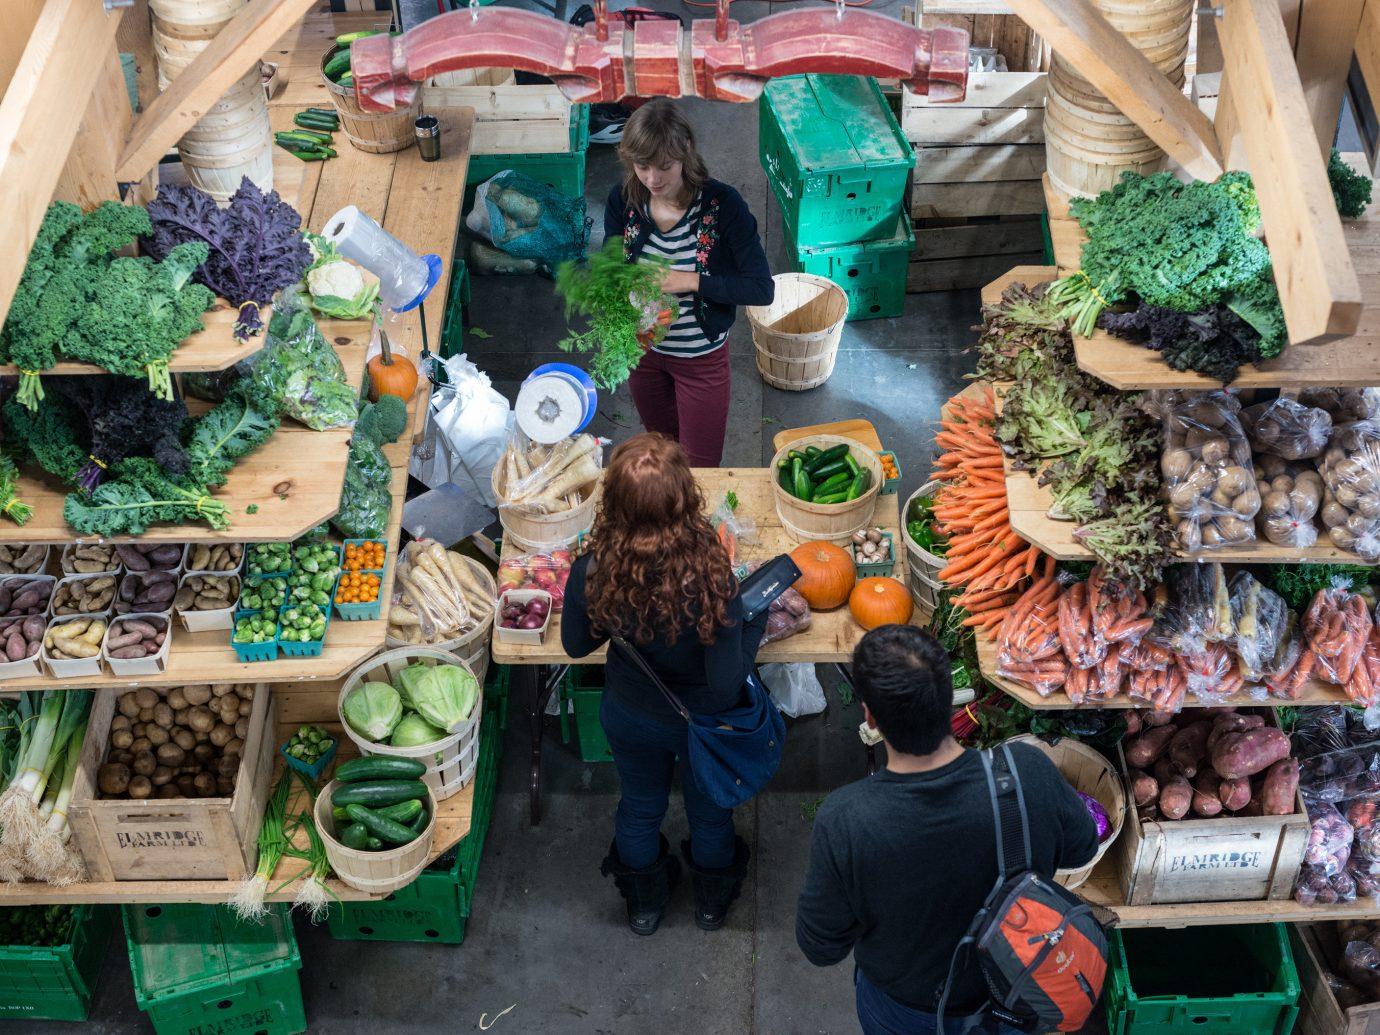 Trip Ideas marketplace market public space City vendor human settlement bazaar food flower